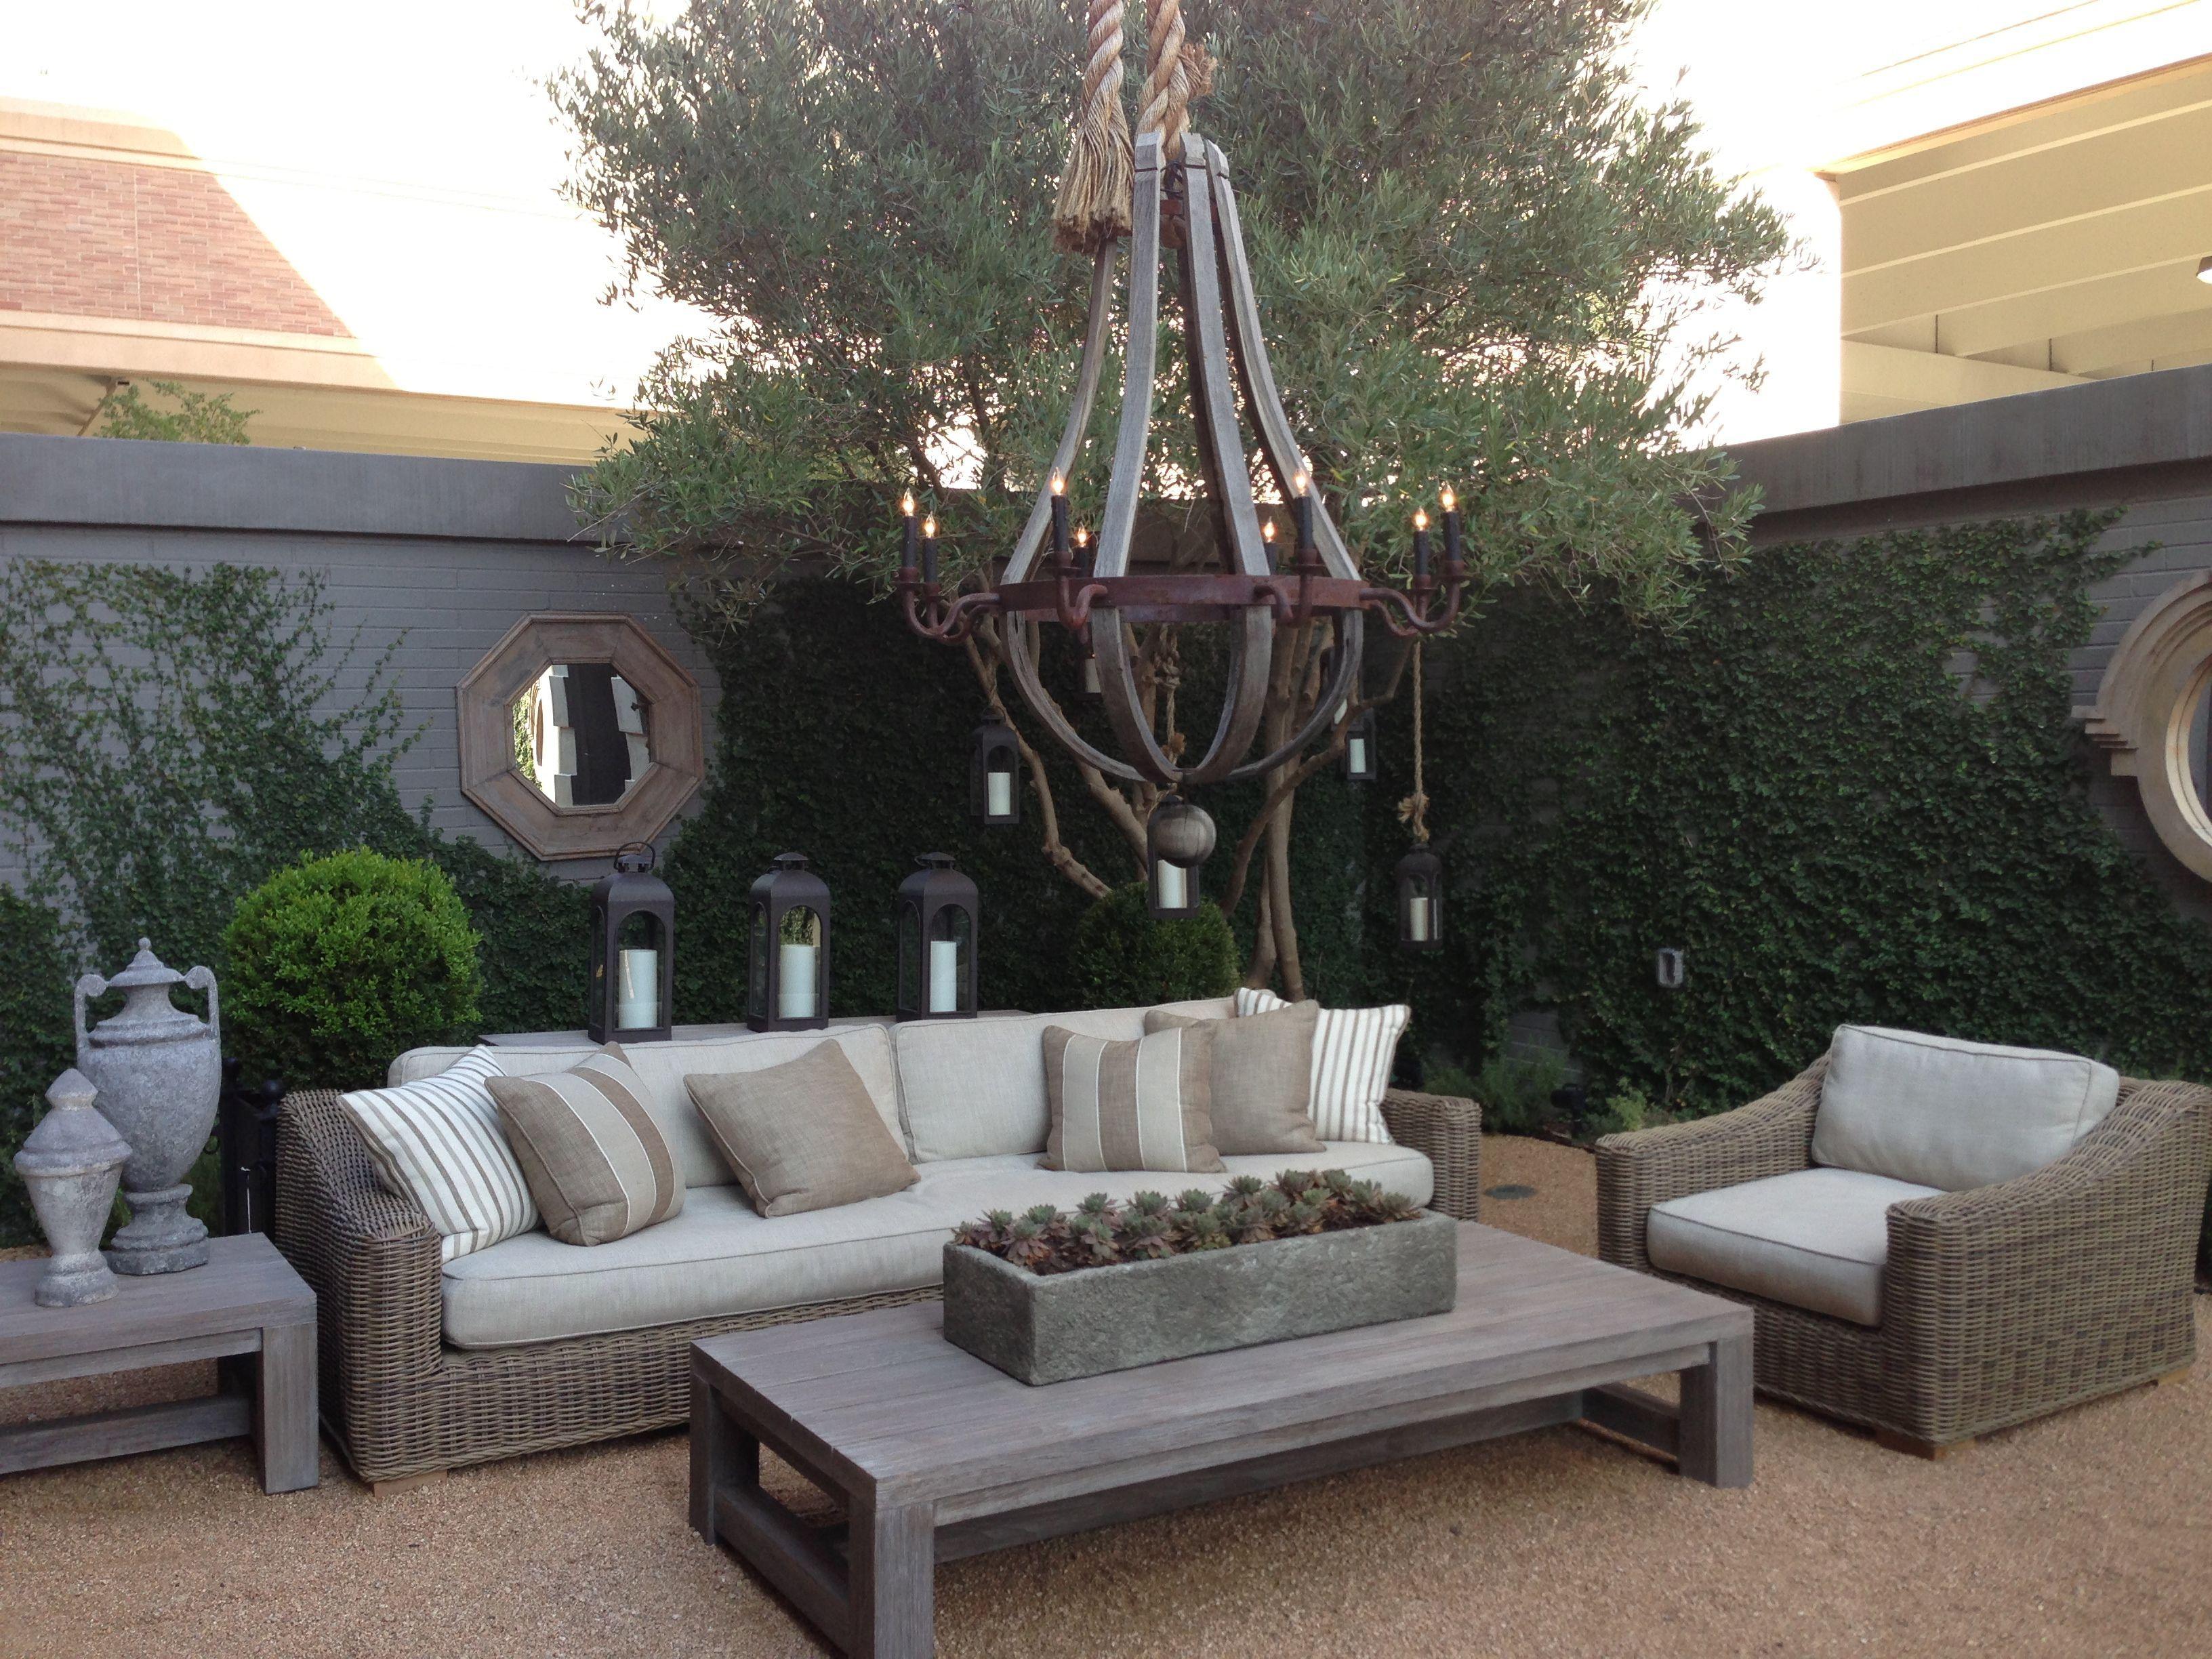 20 Diy Outdoor Furniture Ideas To Perk Up Your Gardens Restoration Hardware Outdoor Restoration Hardware Outdoor Furniture Diy Patio Cover